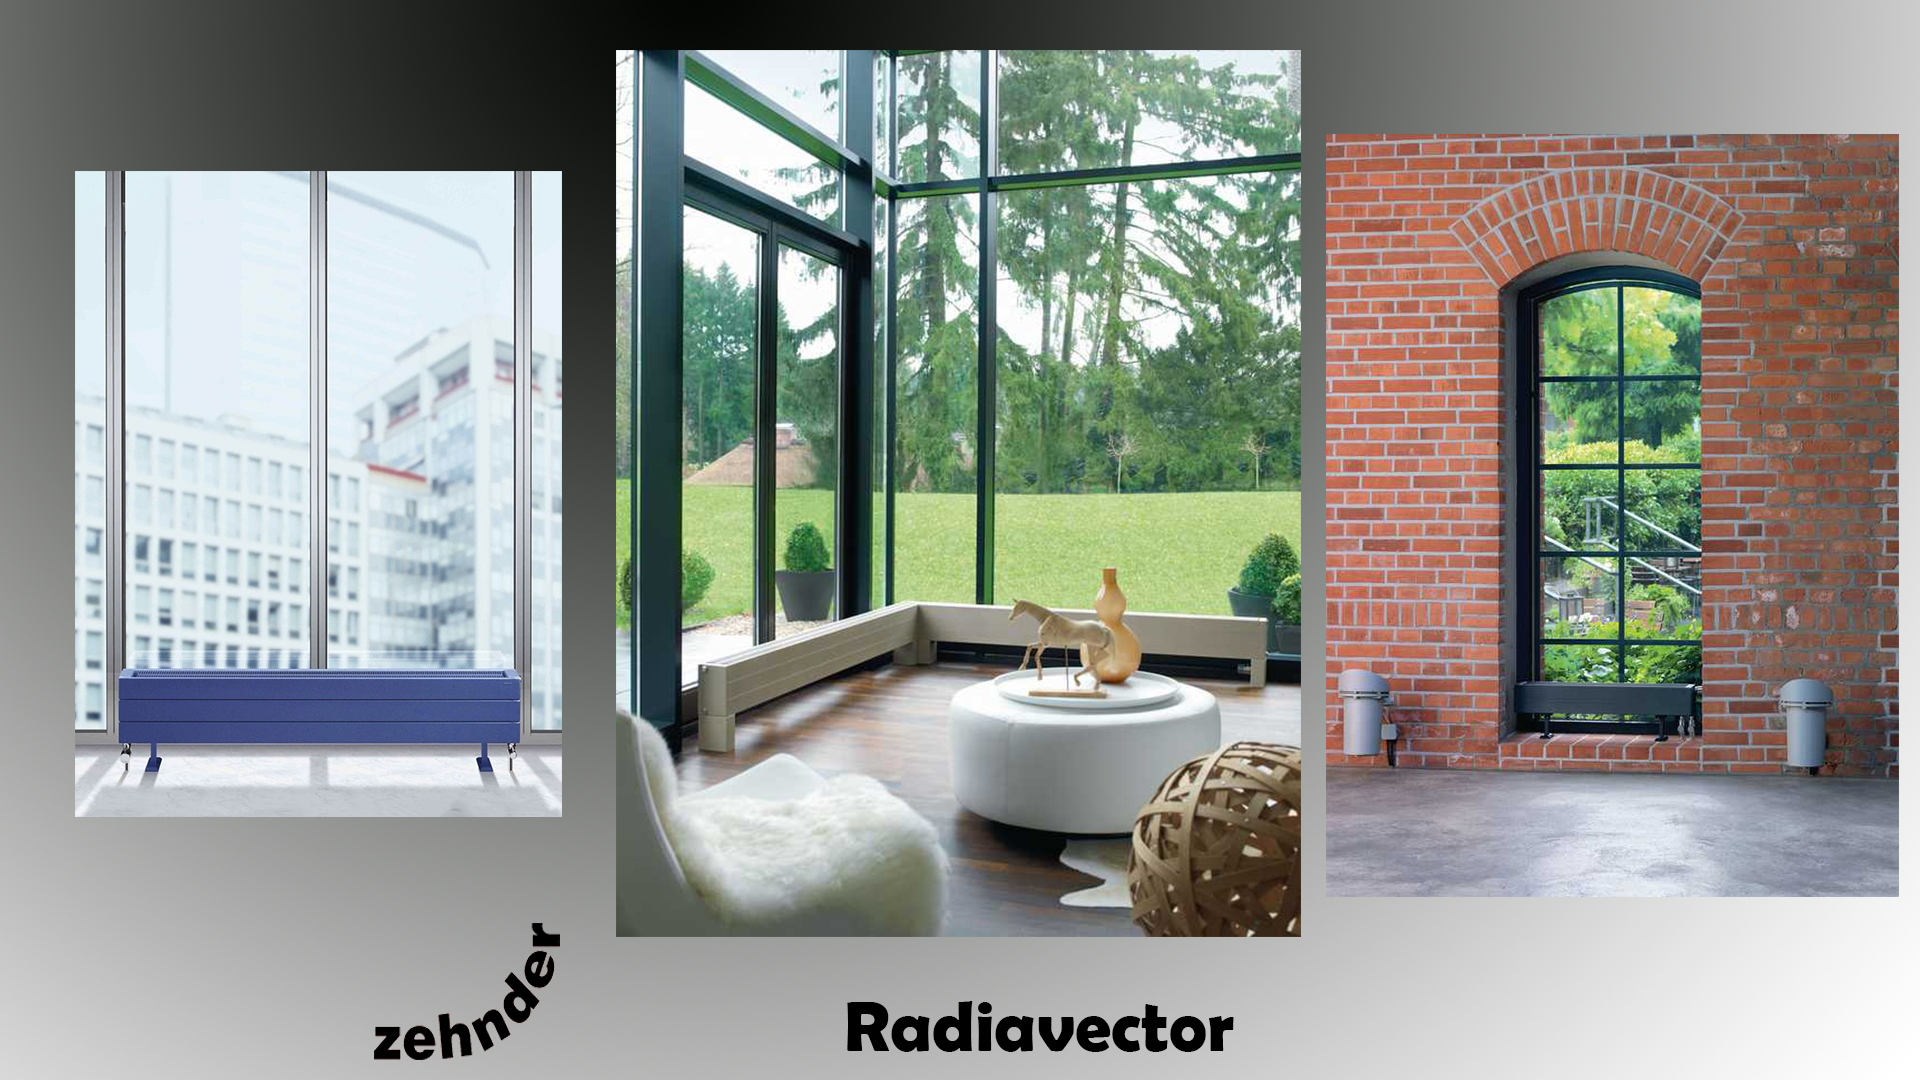 Radiavector